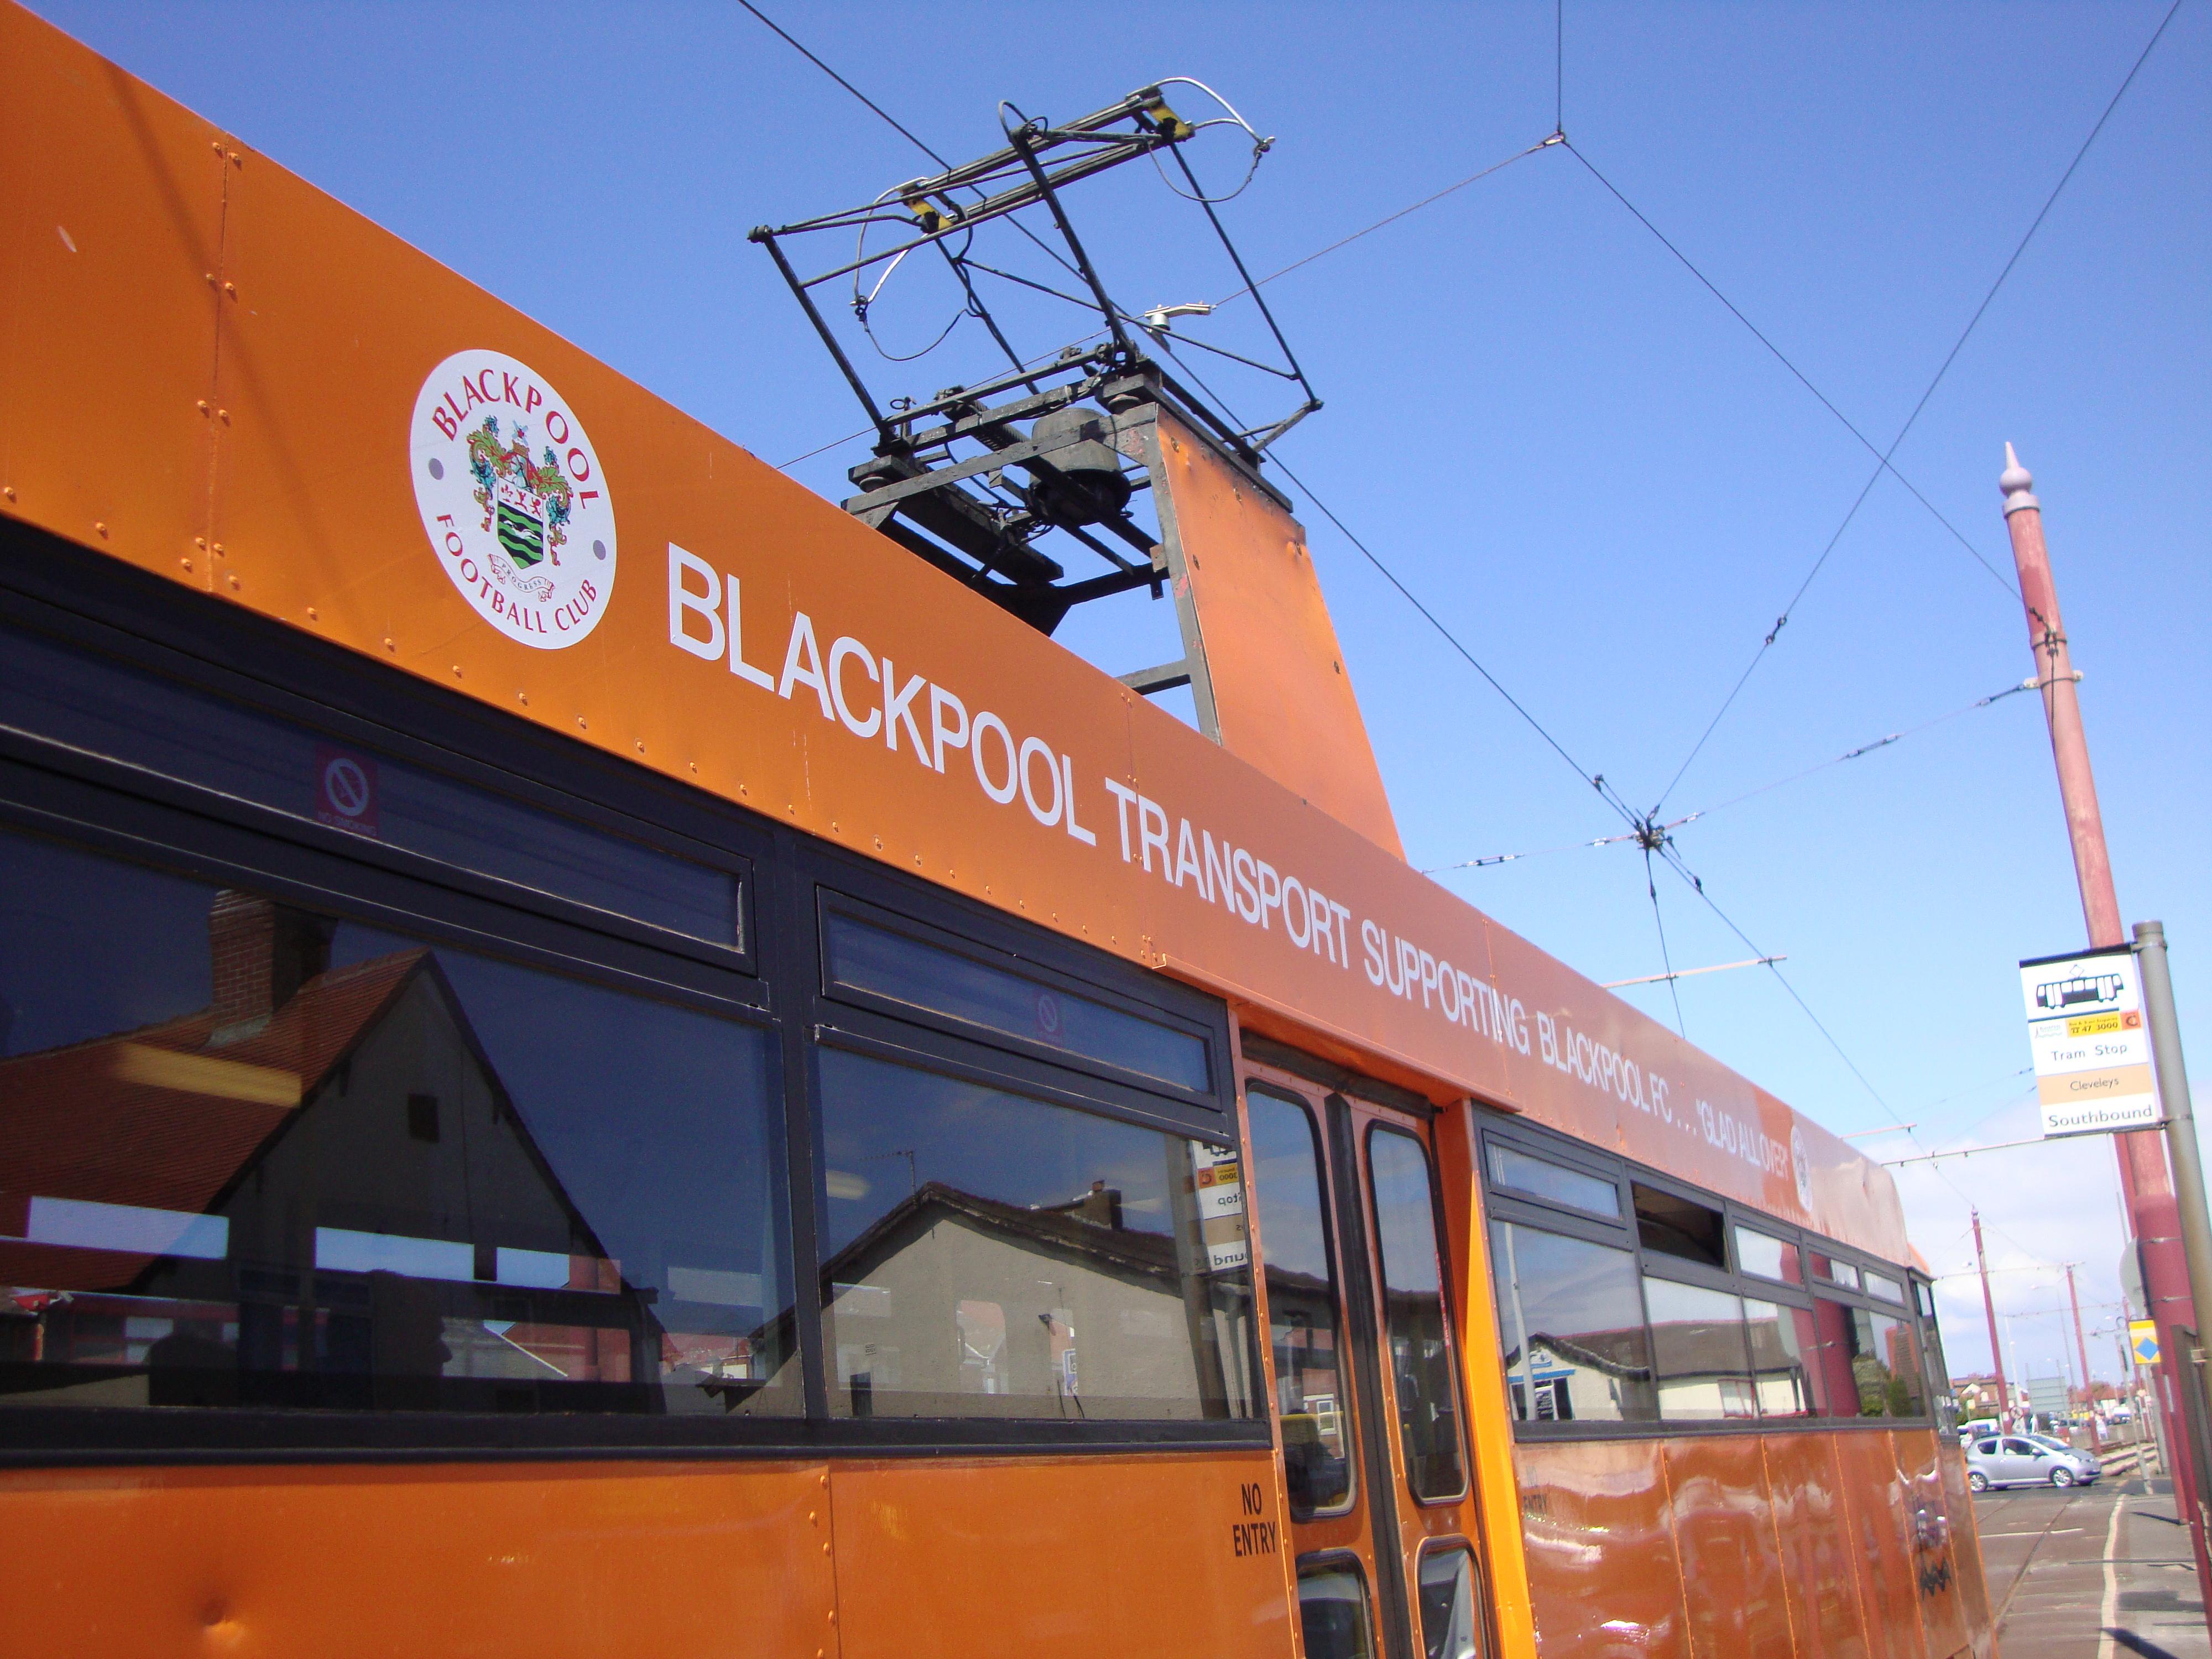 641 - CELEBRATING BLACKPOOL F.C.